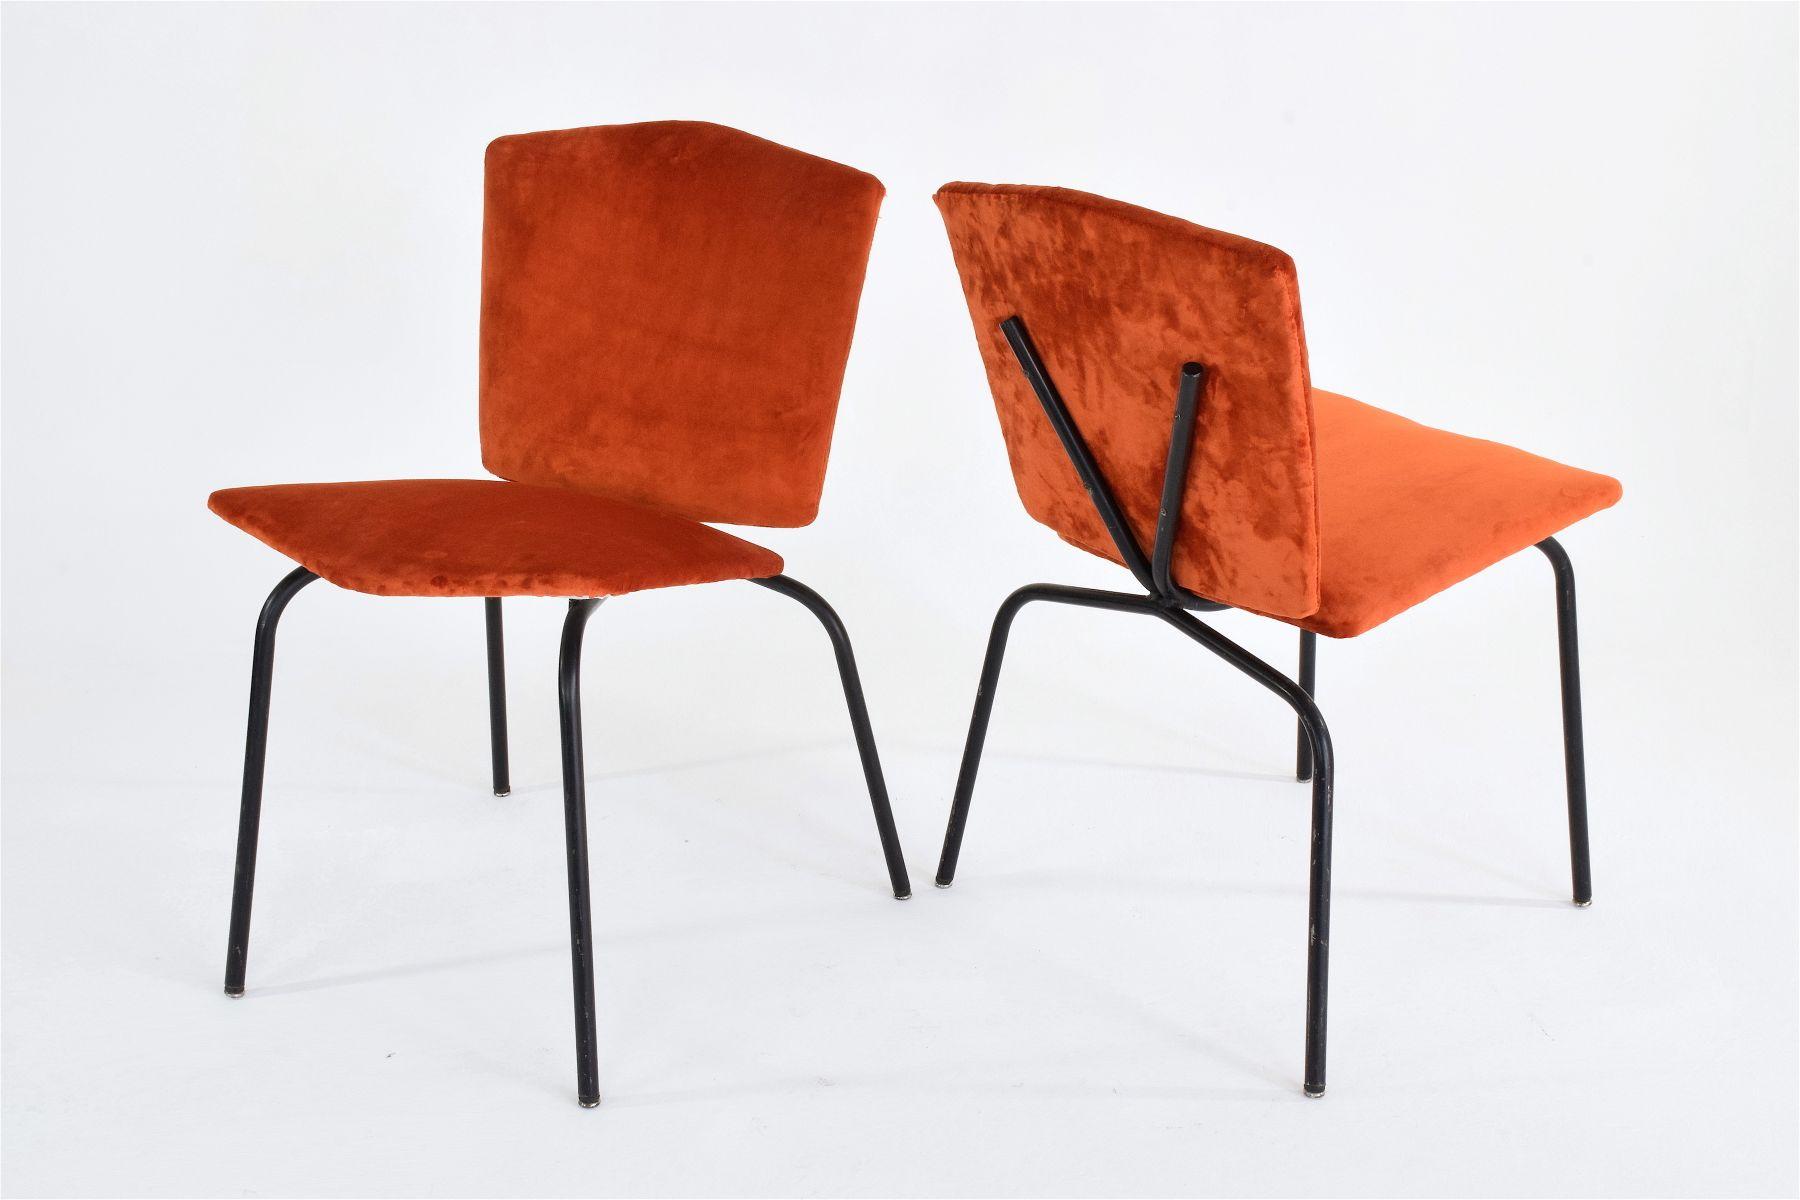 Sedie mid century di velluto francia set di 2 in vendita for Sedie design velluto